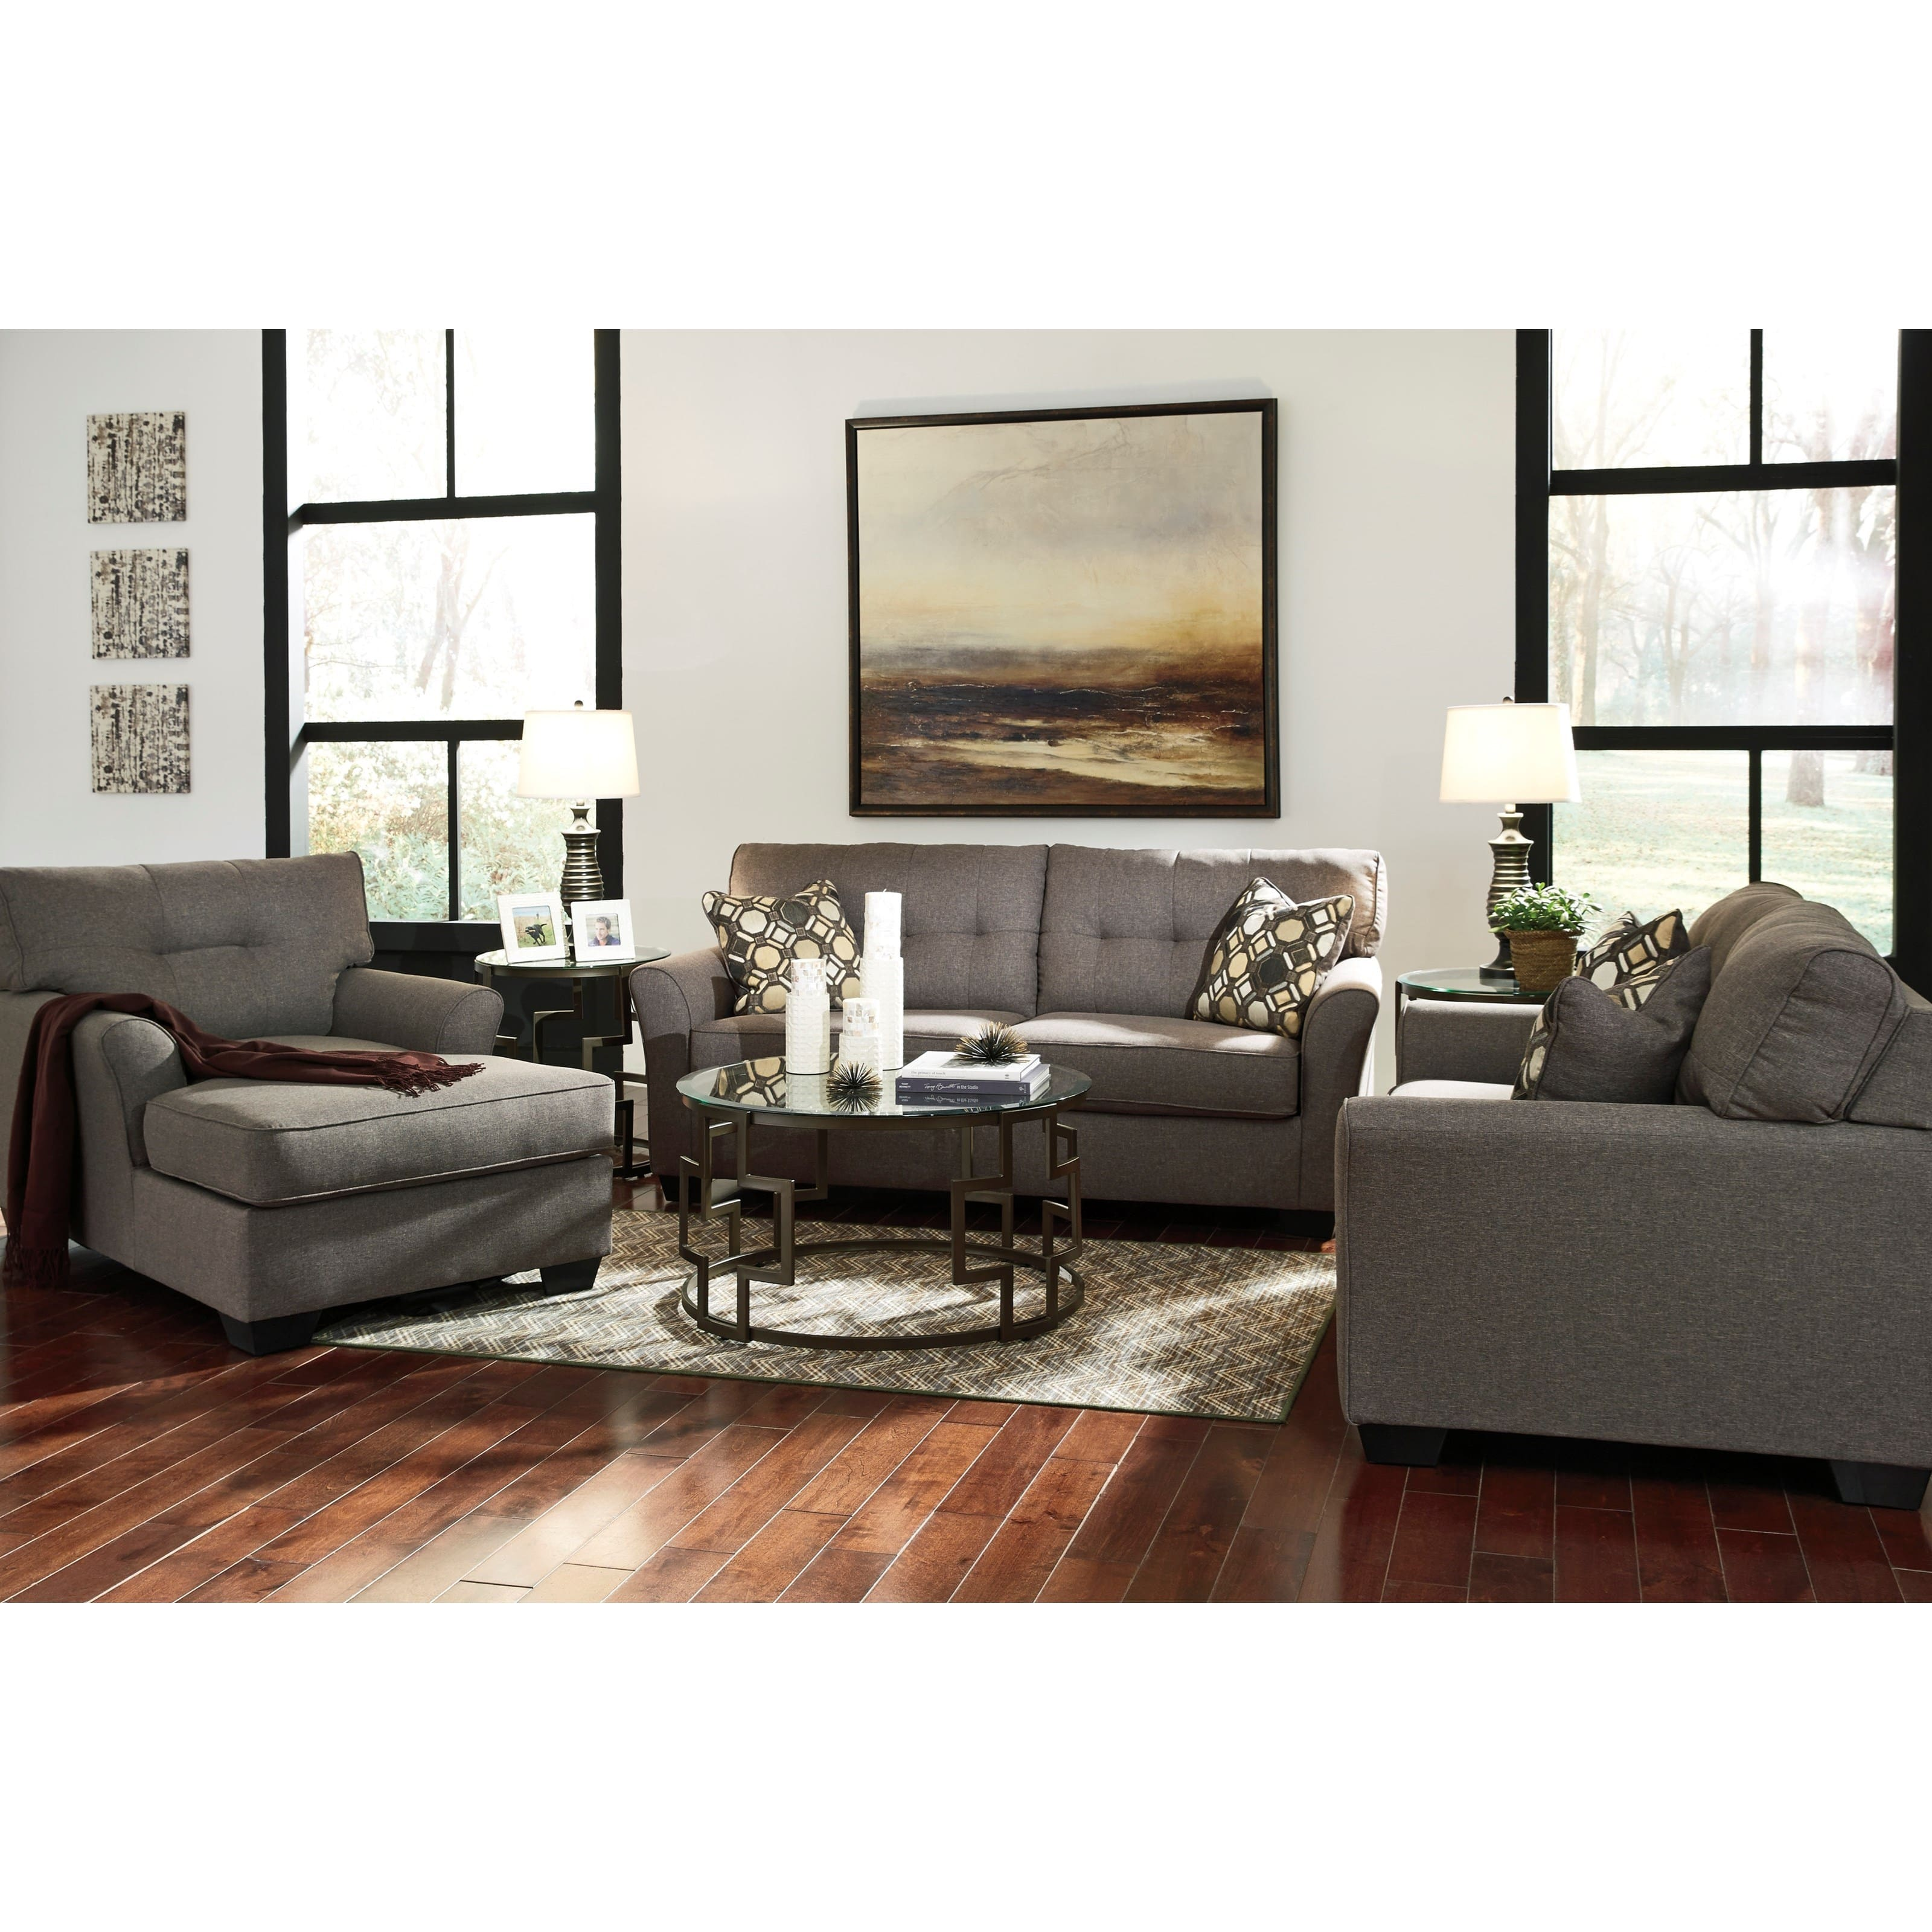 Ashley Homestore: Tibbee 5-Piece Living Room Set $748, Darcy Sofa $298 & Loveseat $248